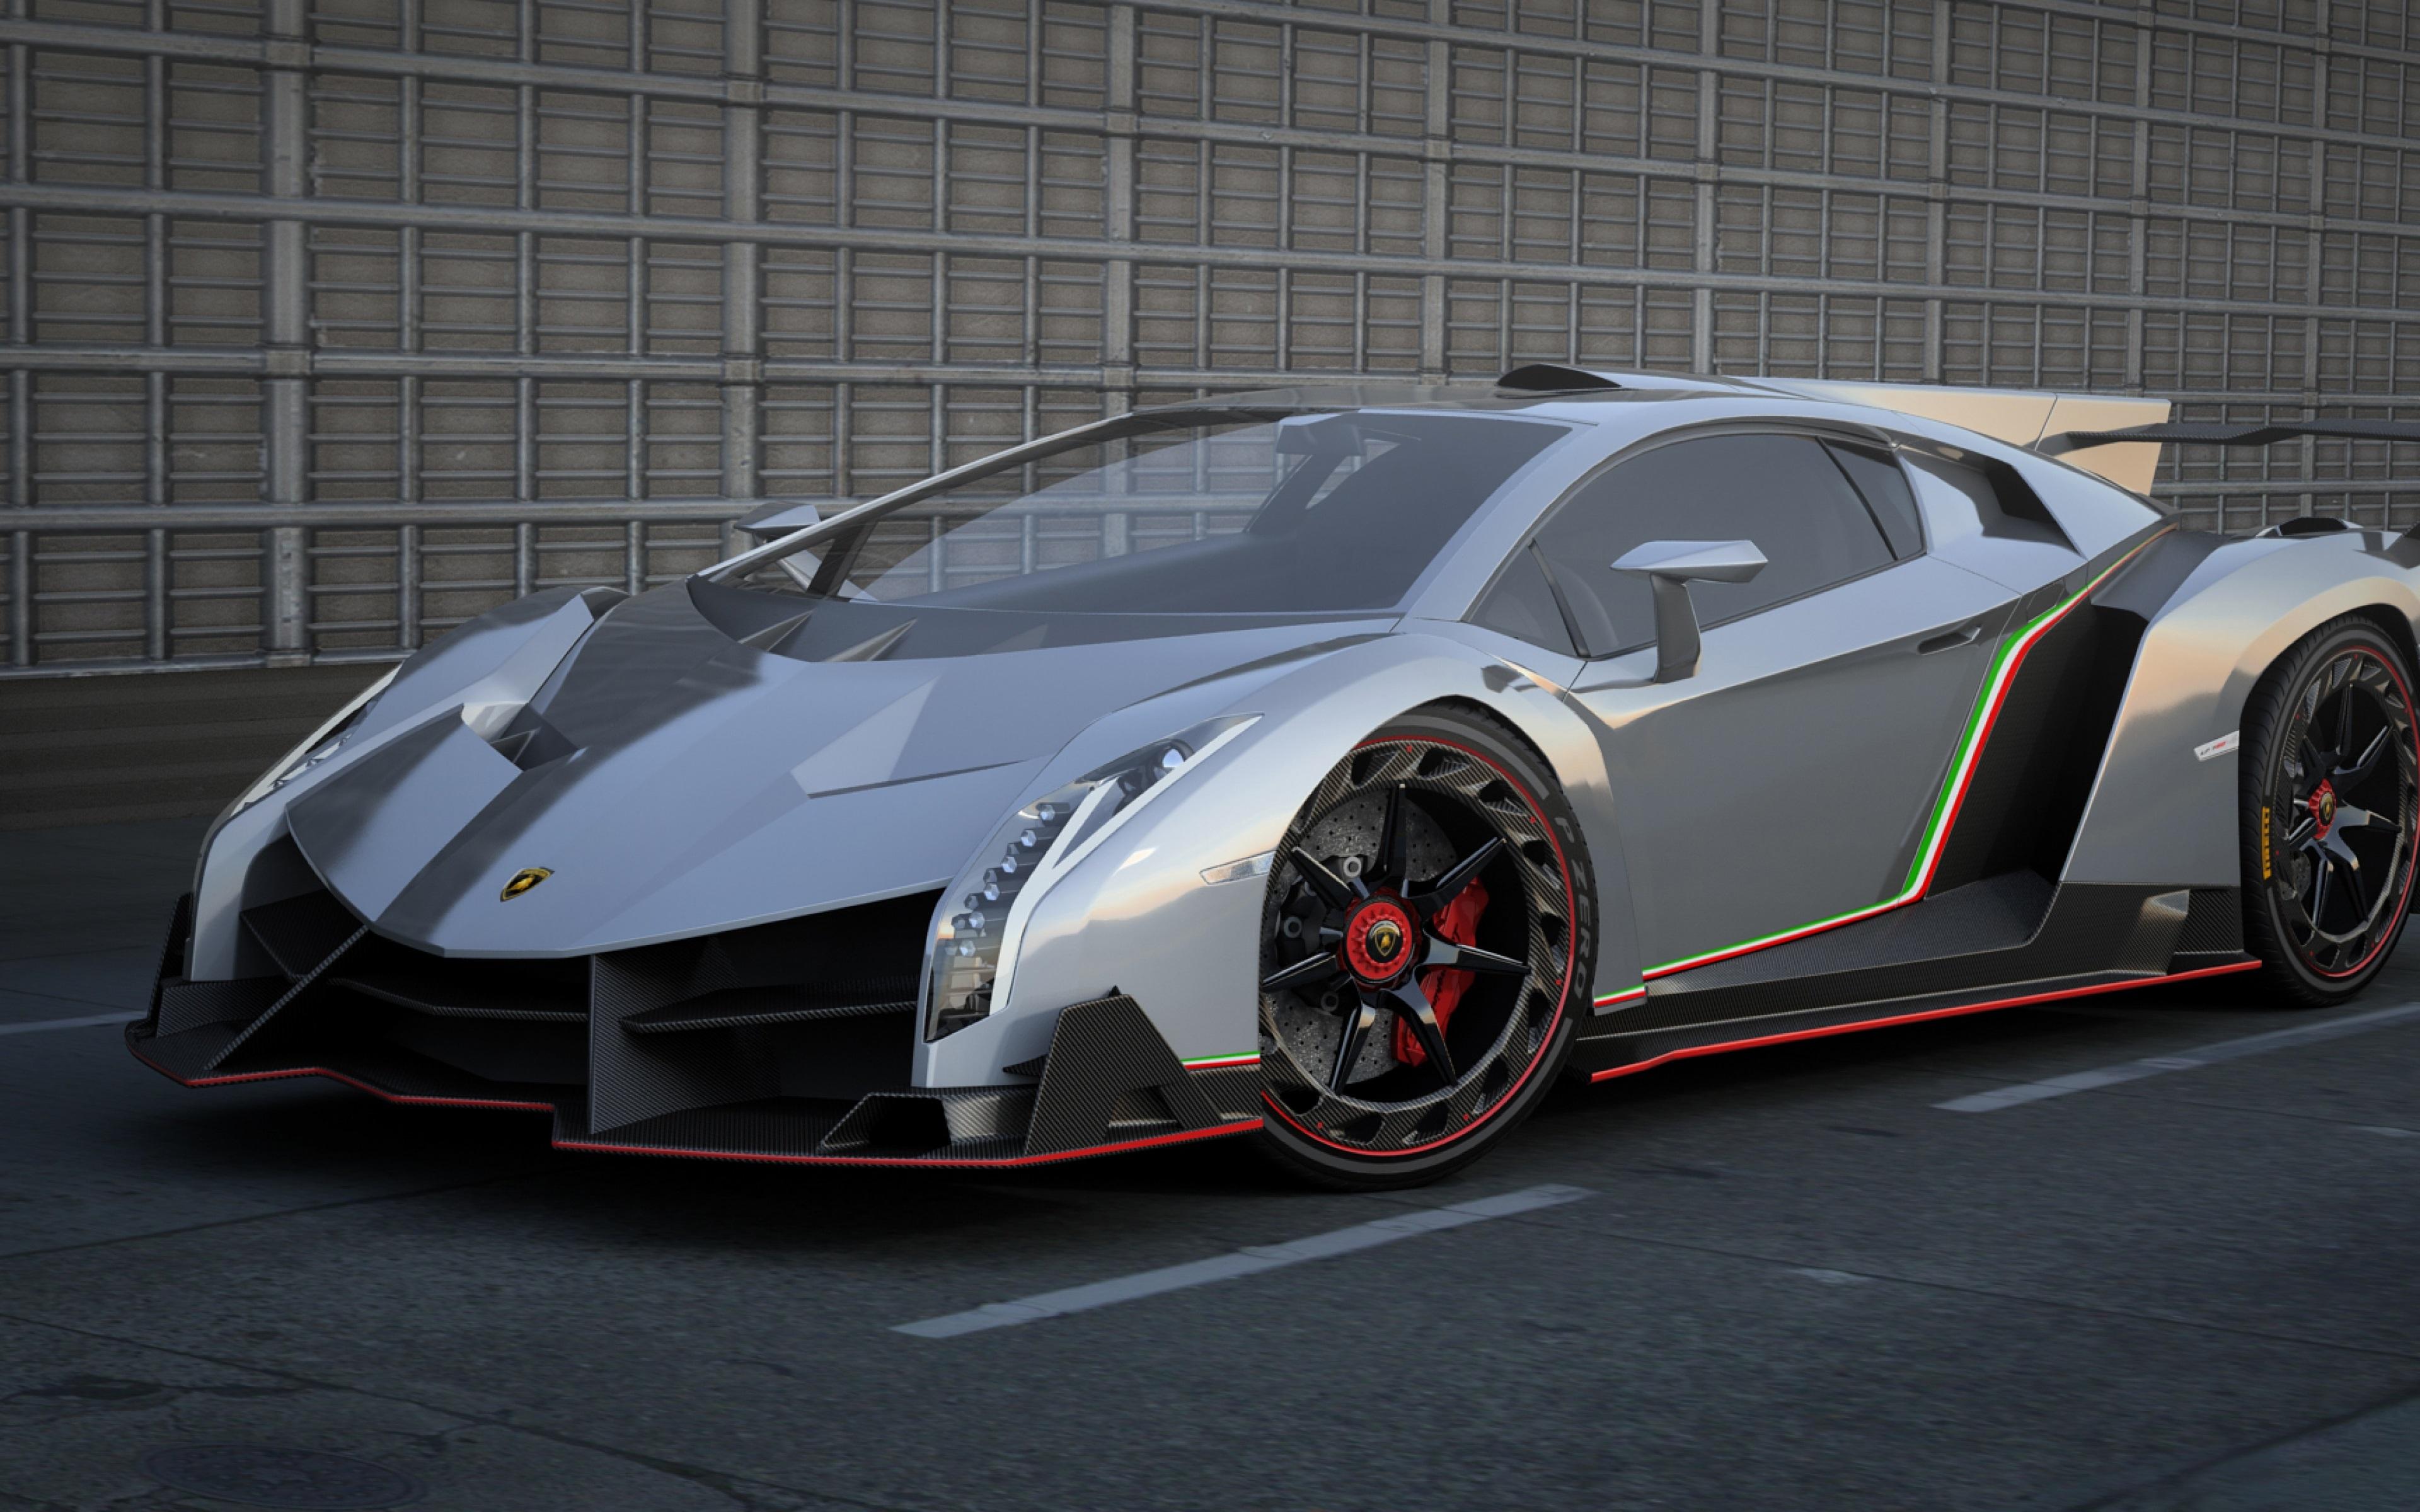 Lamborghini Veneno 4k Wallpaper Download 422662 Hd